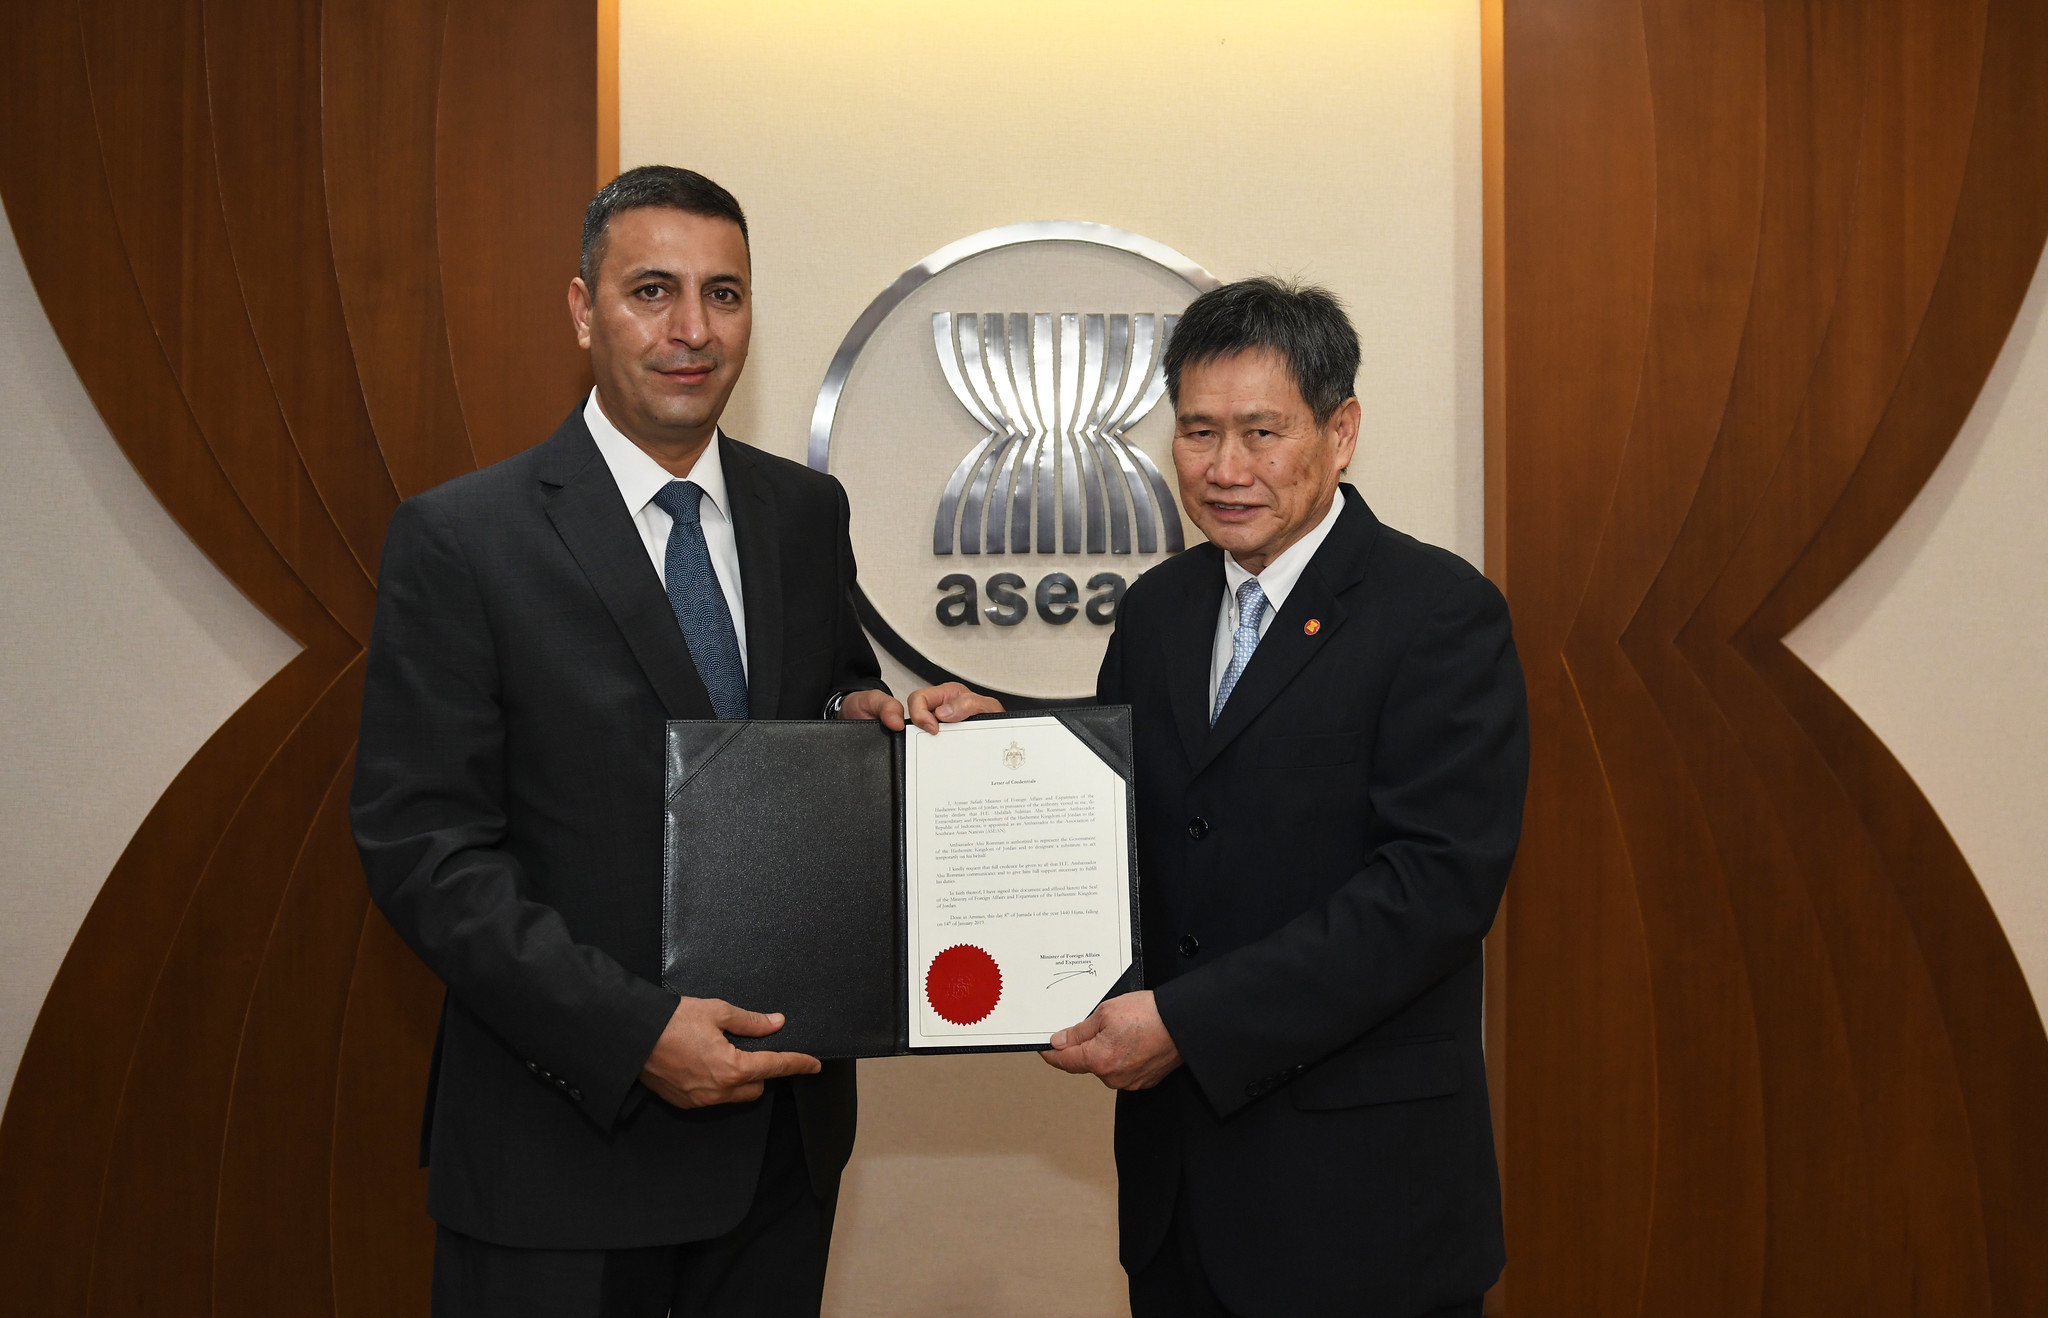 Ambassador of the Hashemite Kingdom of Jordan to ASEAN presents